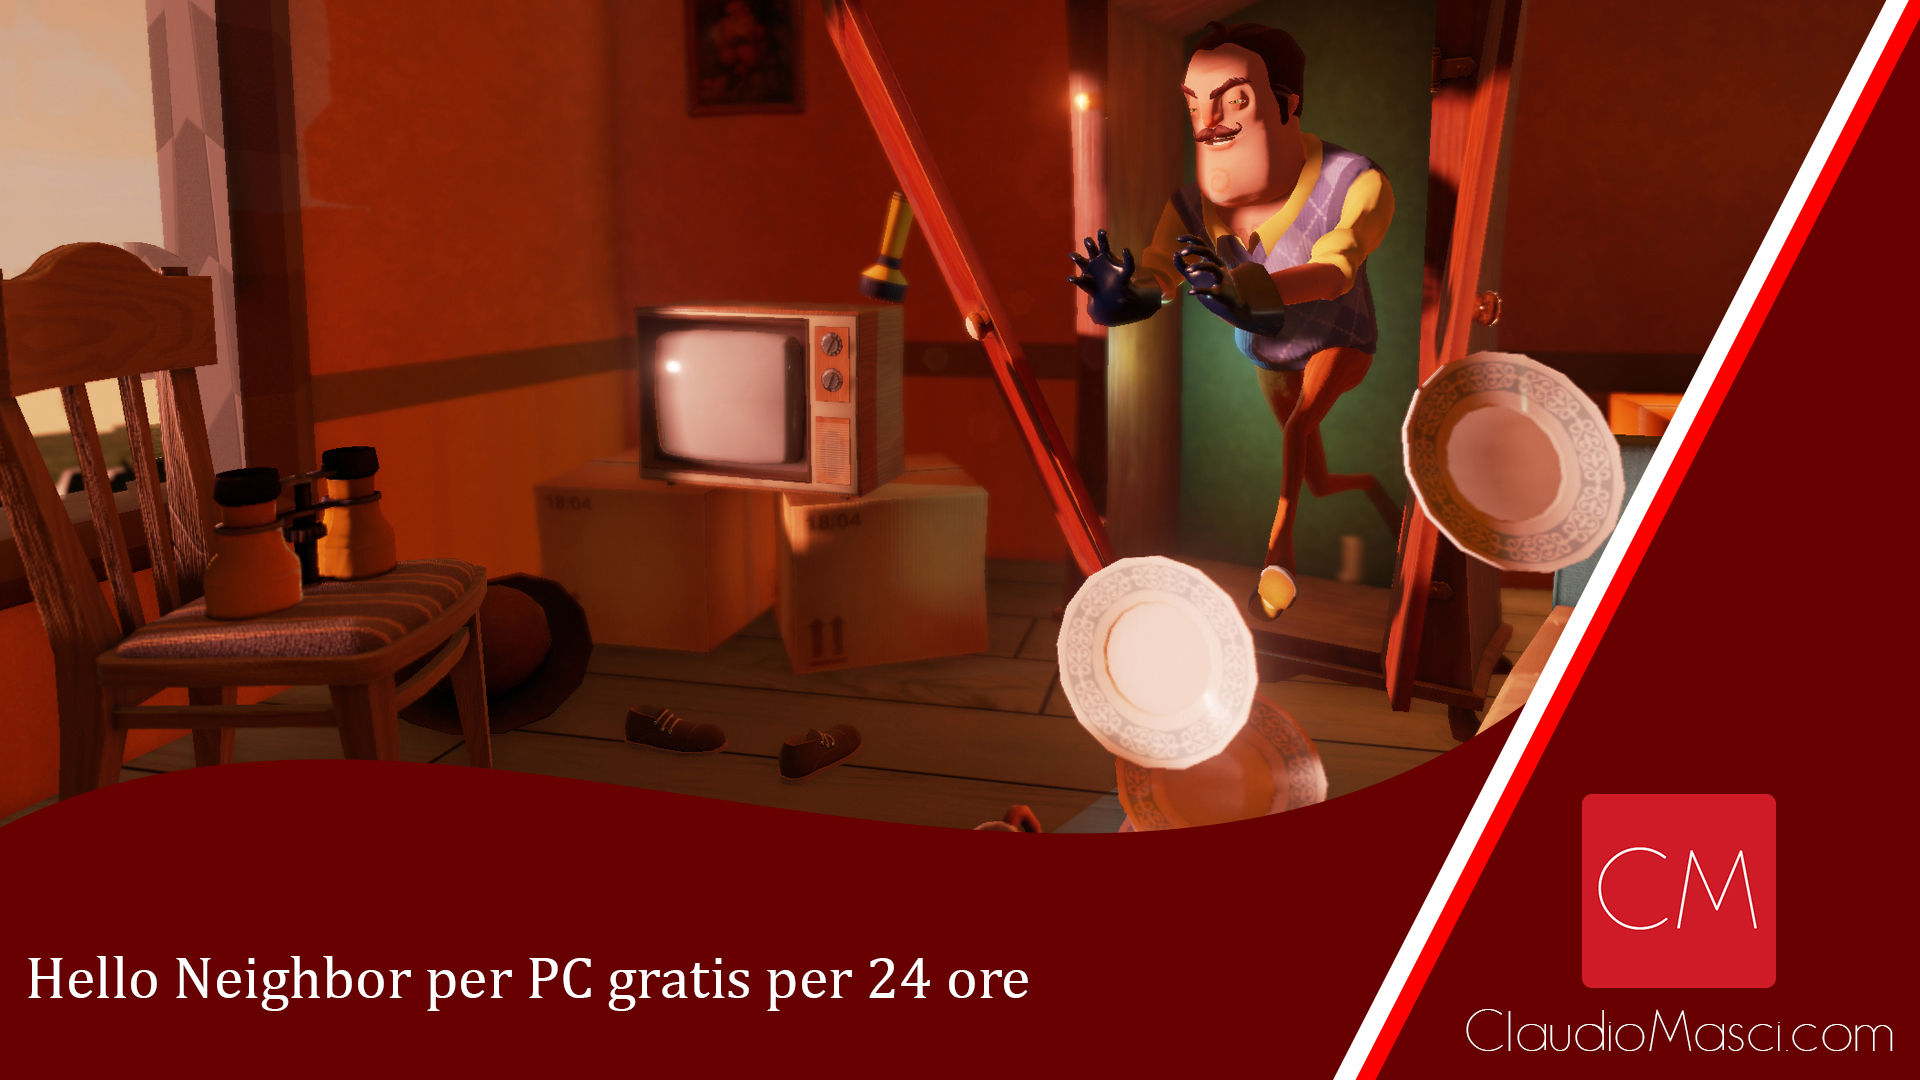 Hello Neighbor per PC gratis per 24 ore